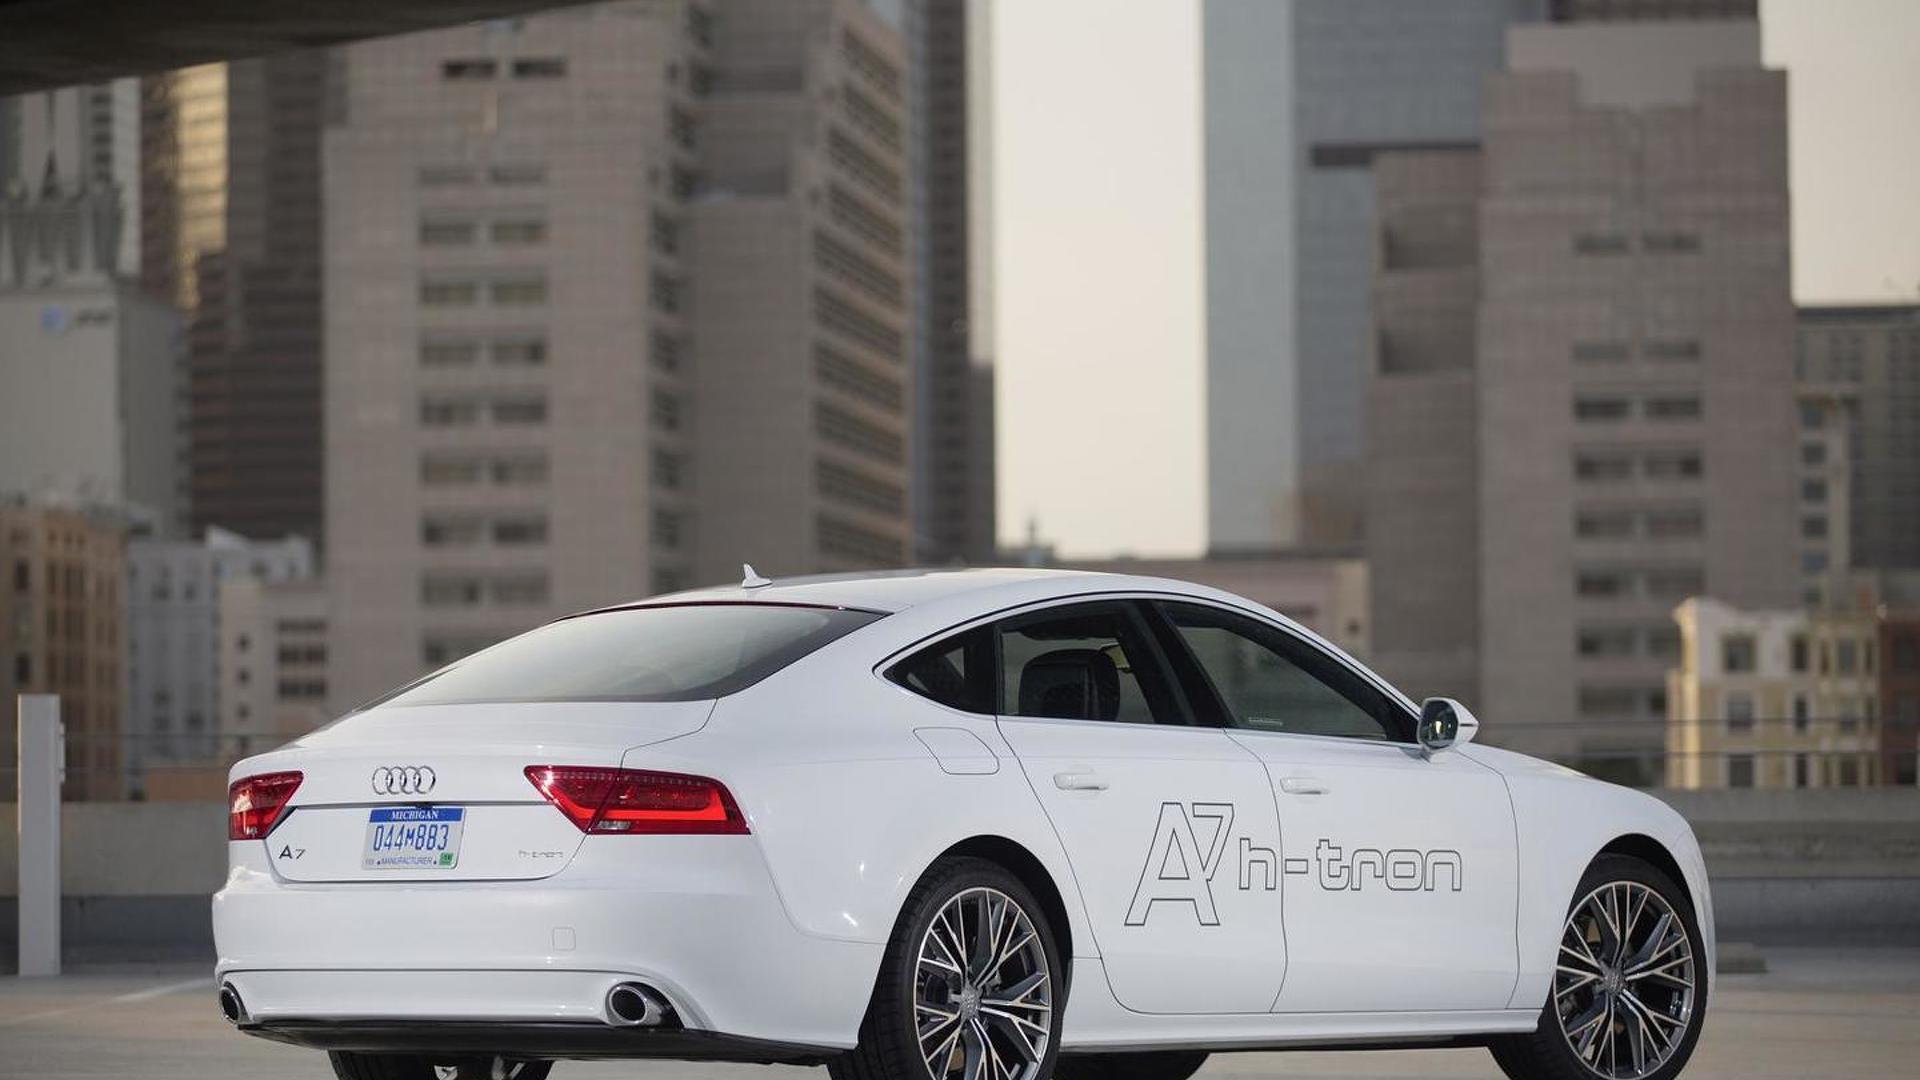 Водородная машина Audi A7 Sportback h-tron quattro